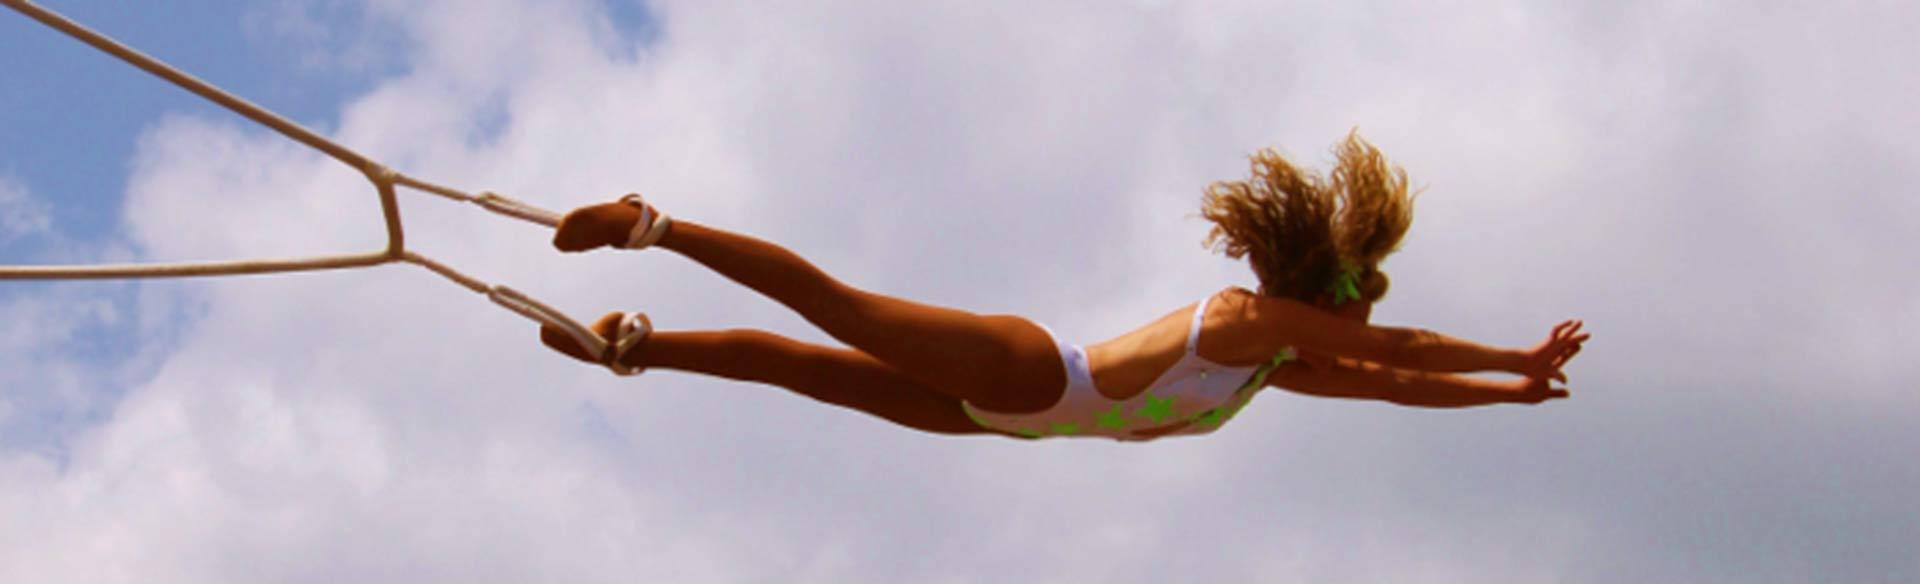 trapeze-artist